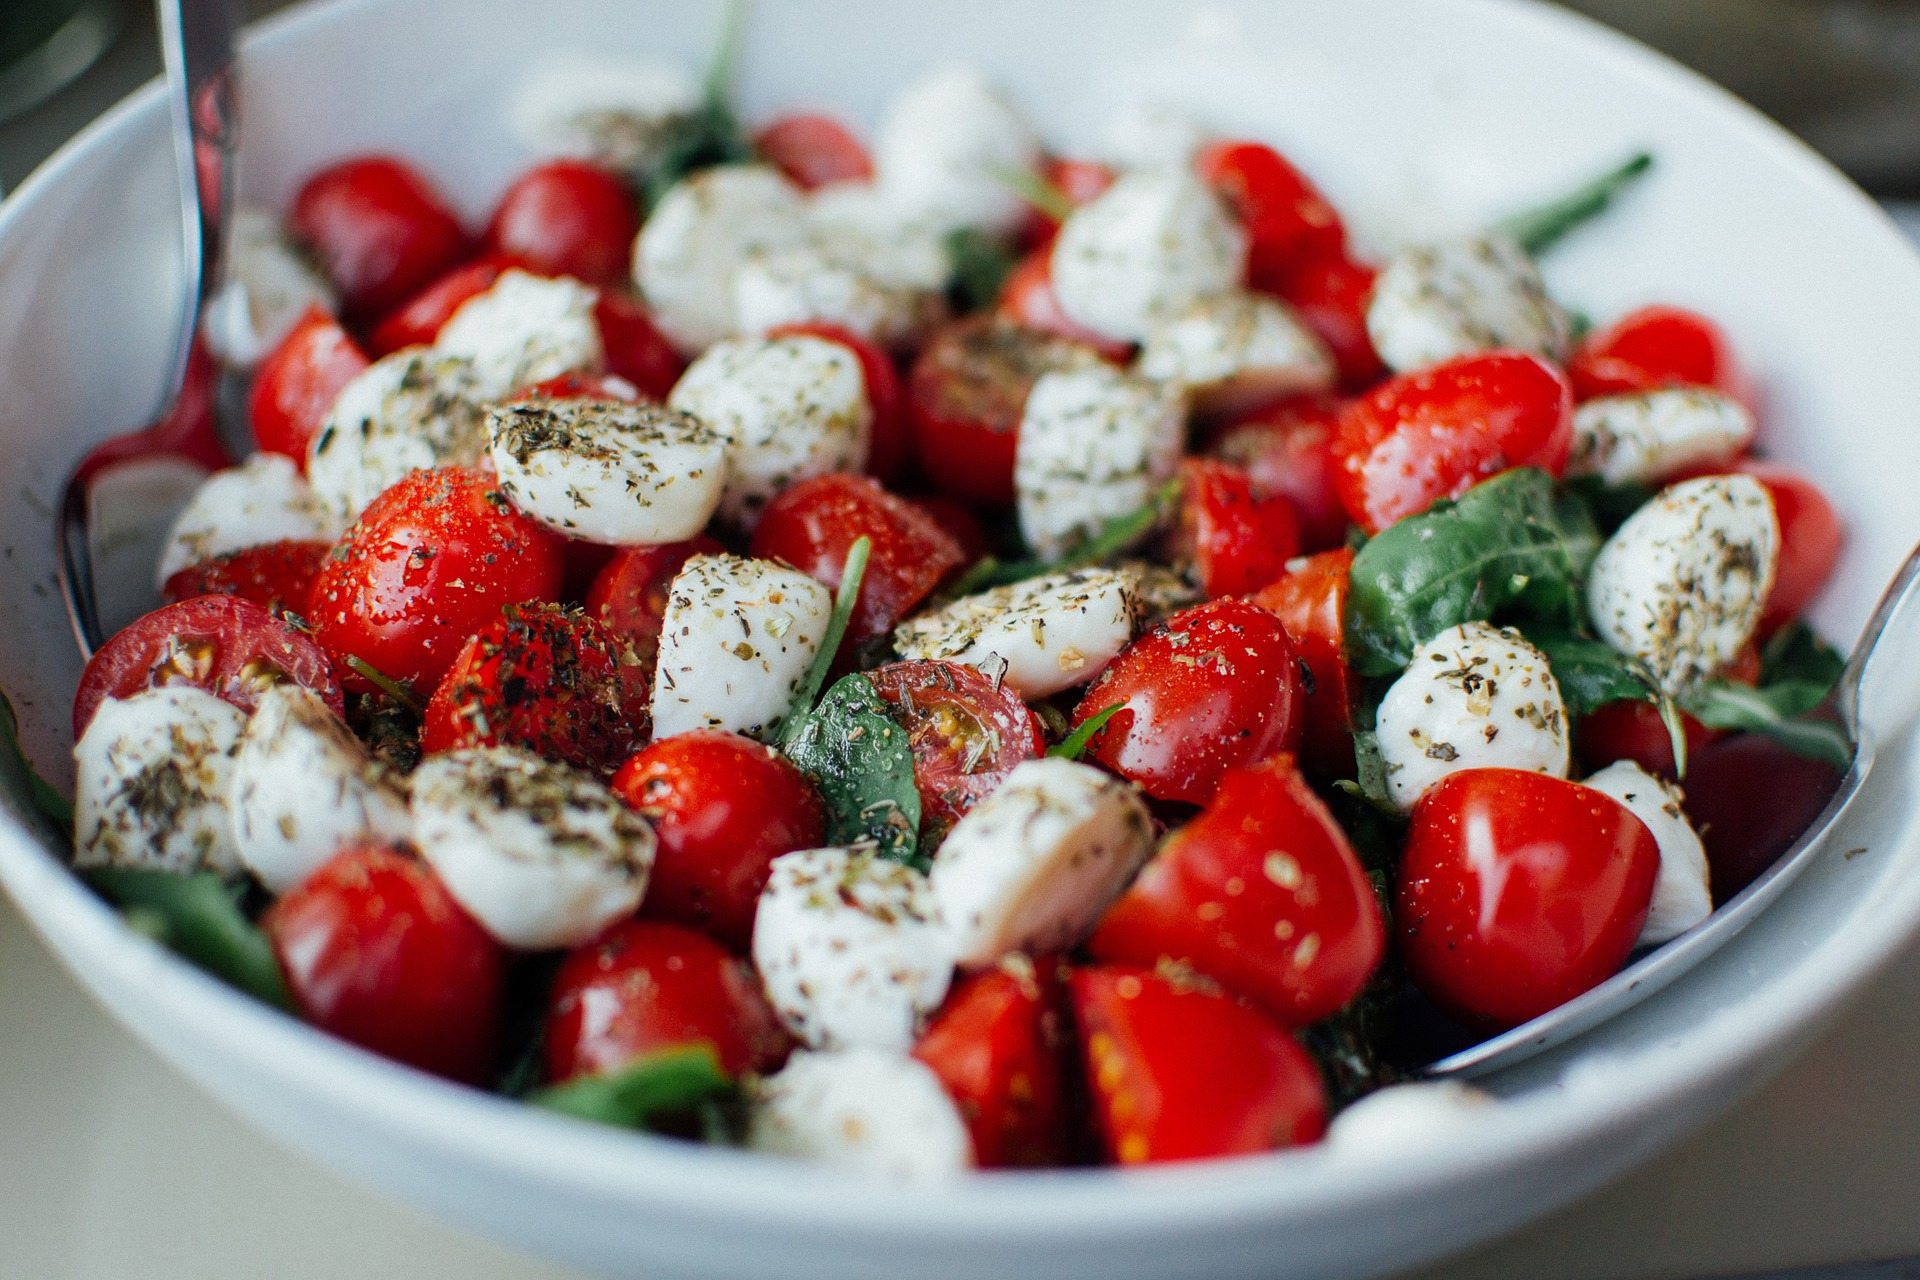 tomatoes-925698_1920.jpg